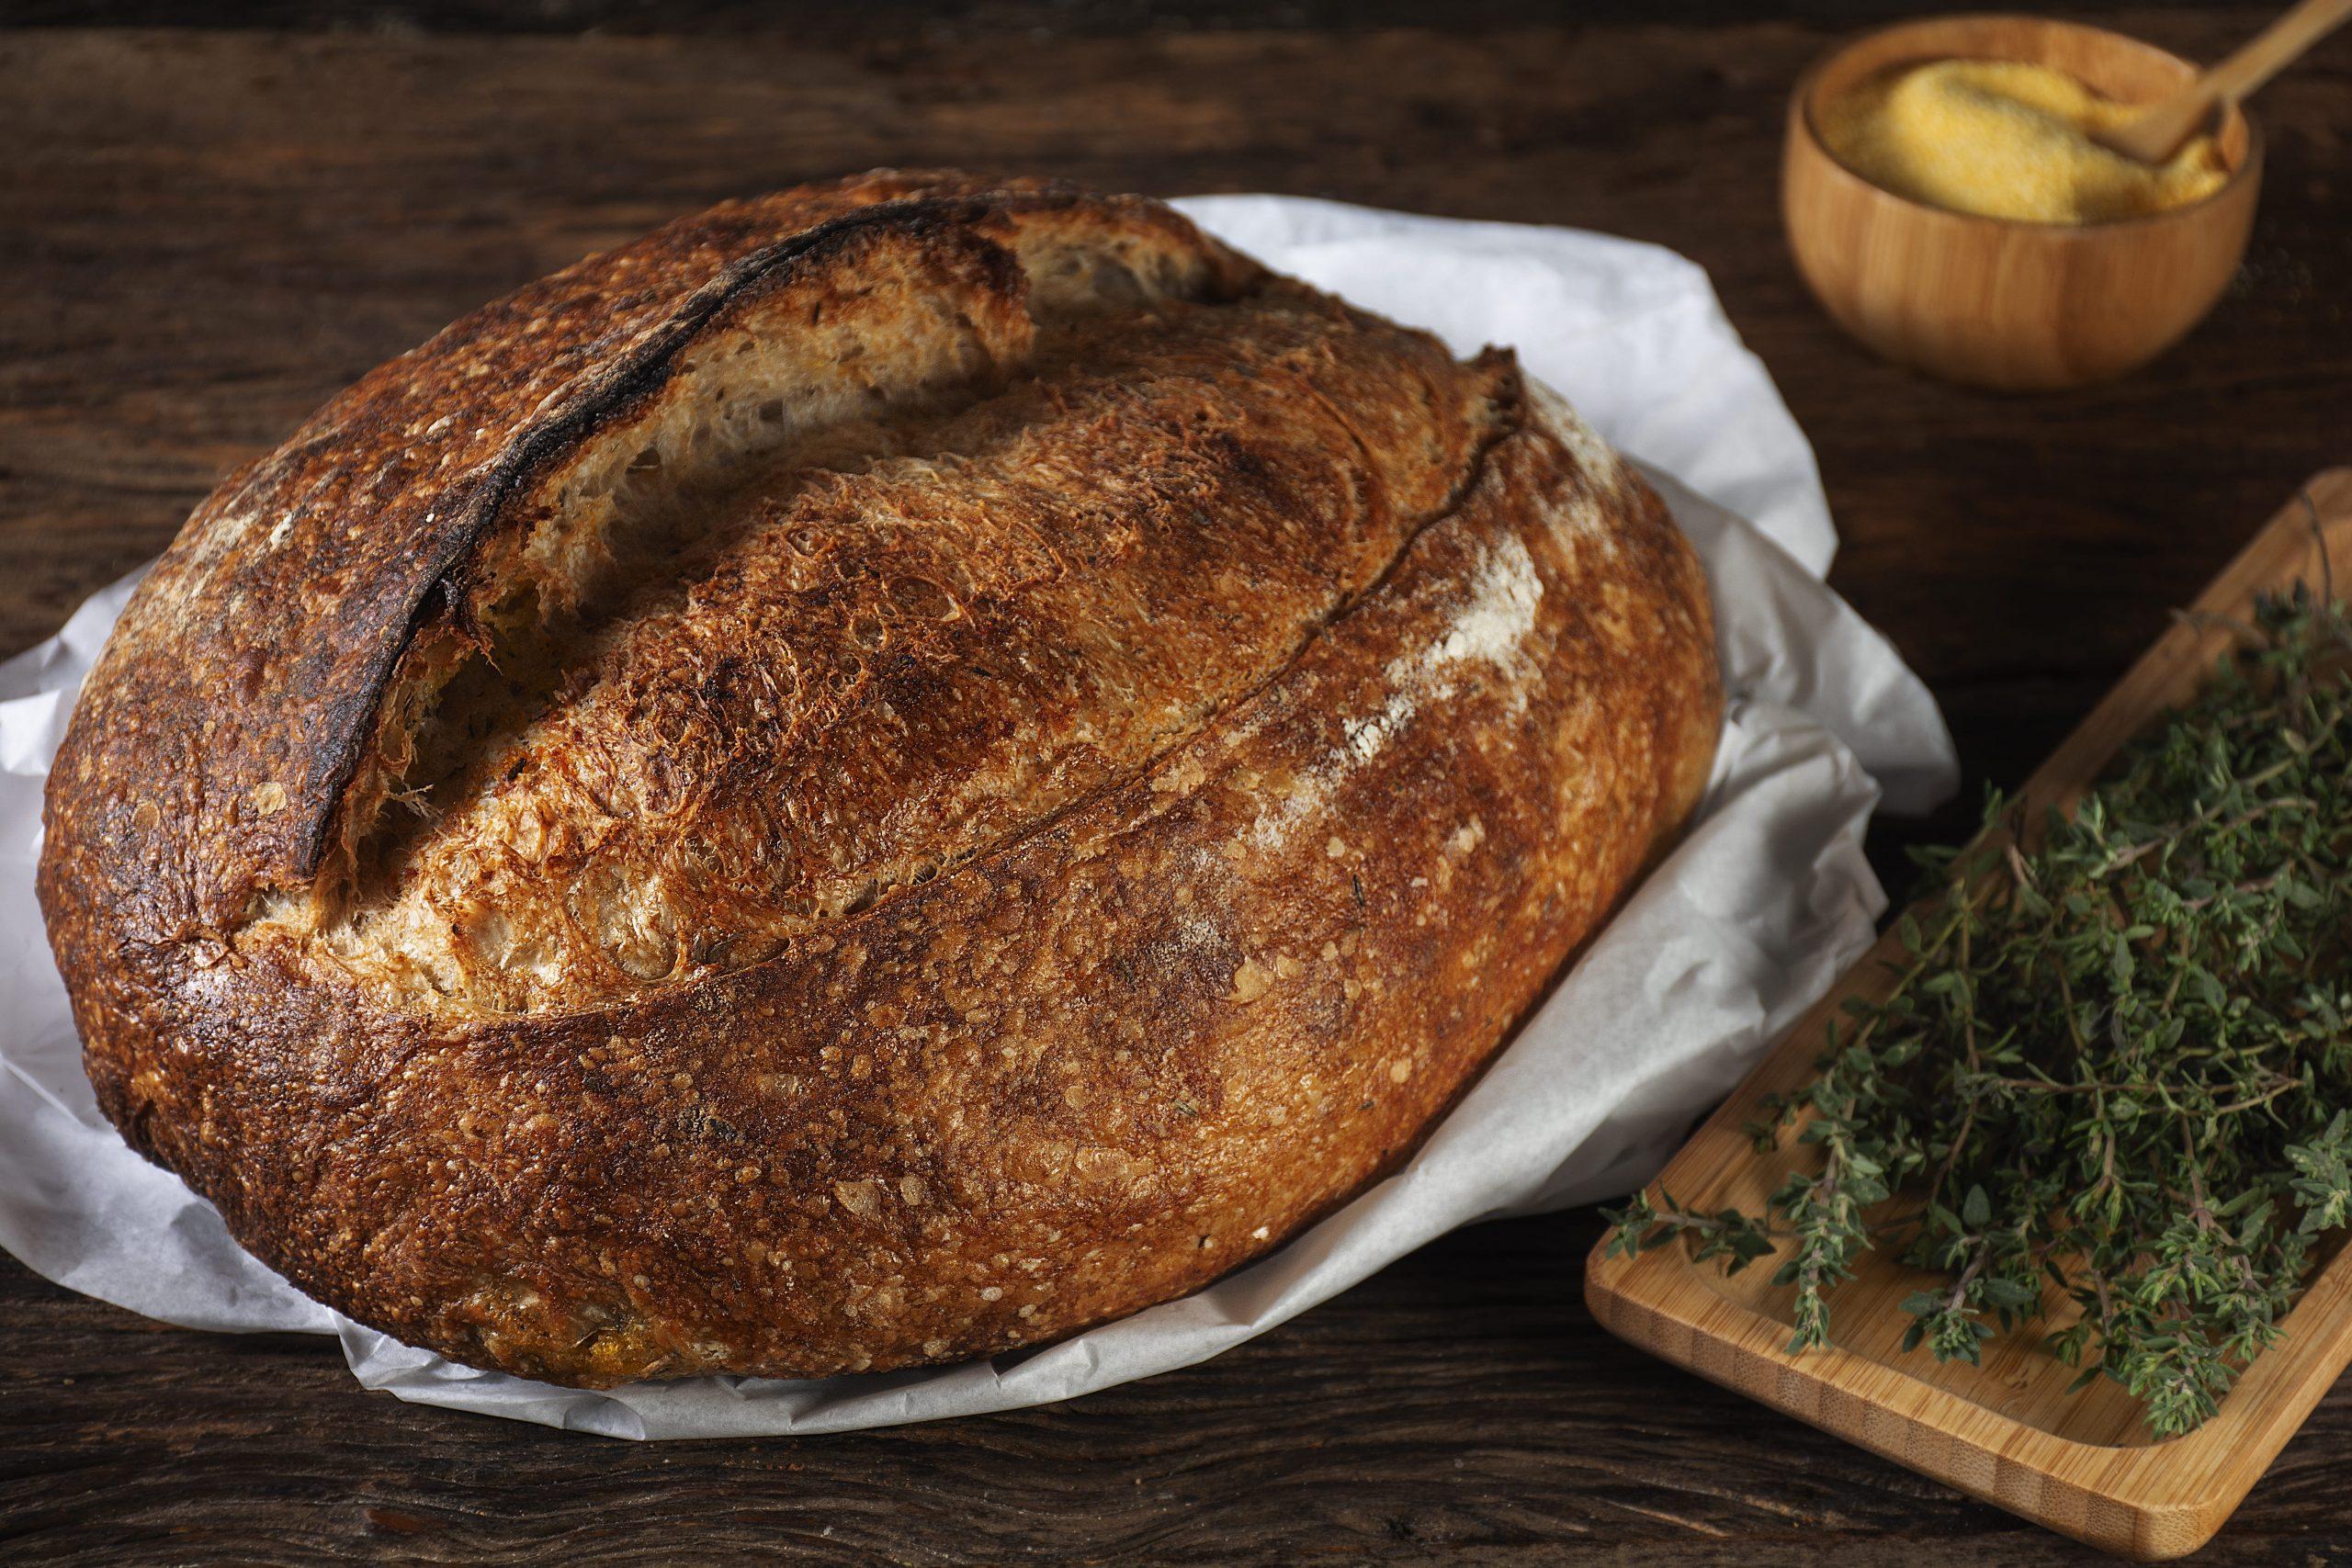 Foto-Artesanos-Bakery_Sourdough-de-polenta-com-tomilho-01_Credito-Gabriel-Avilla